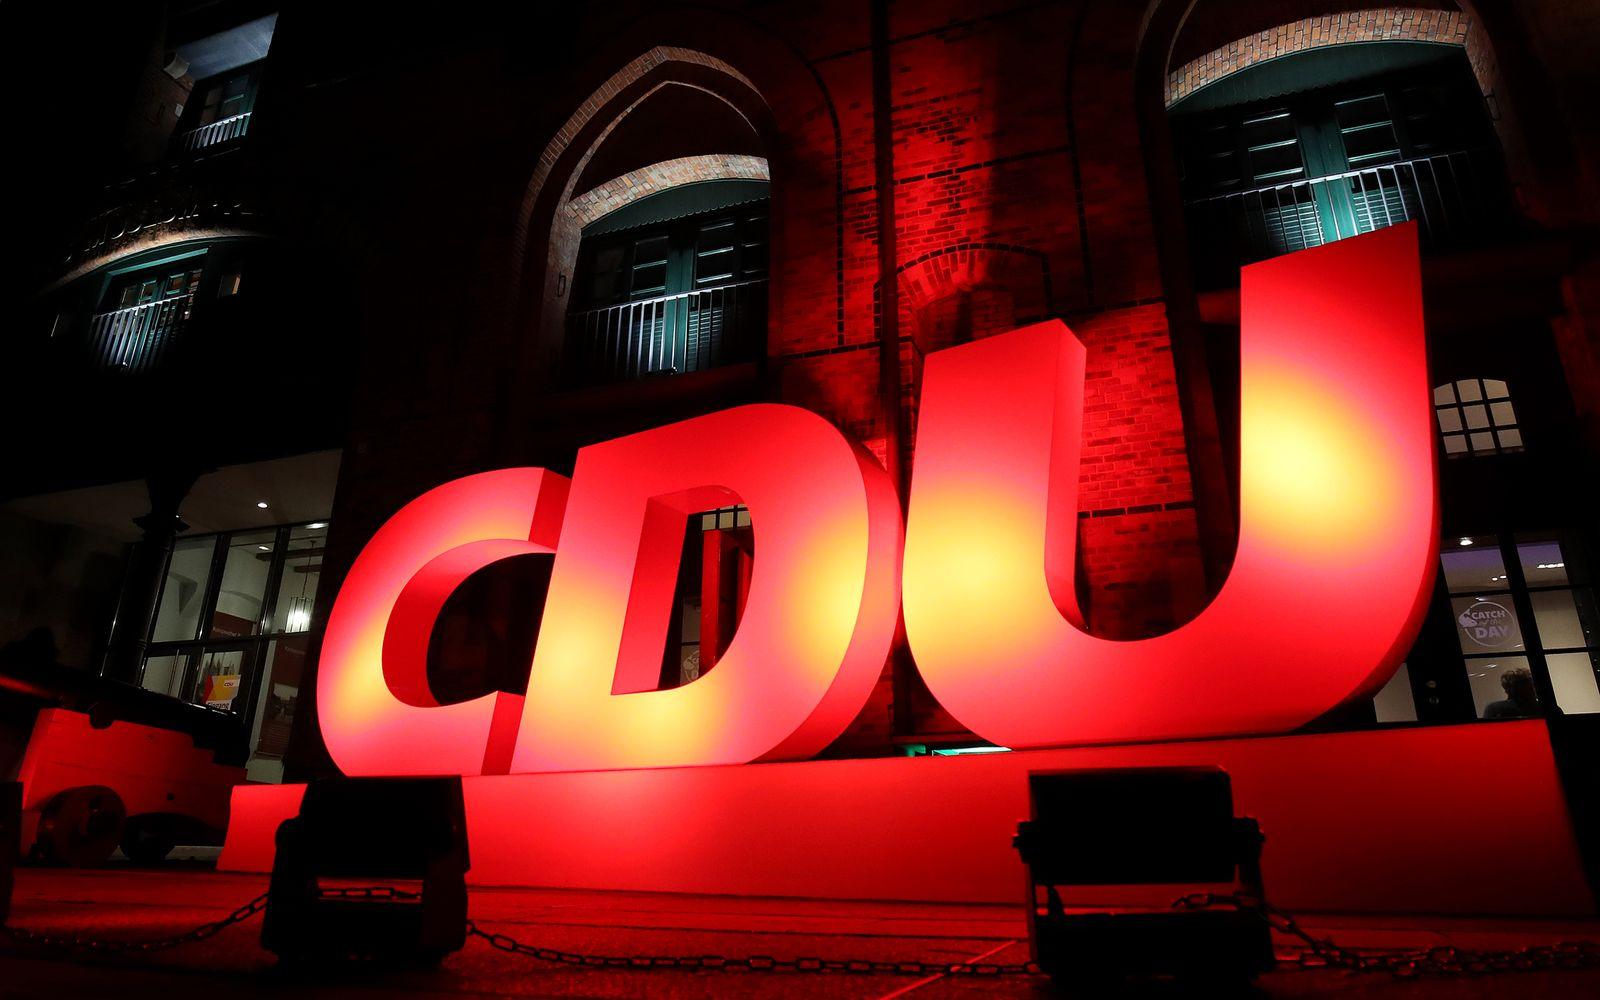 Jahresanfangs-Klausur des CDU-Vorstands